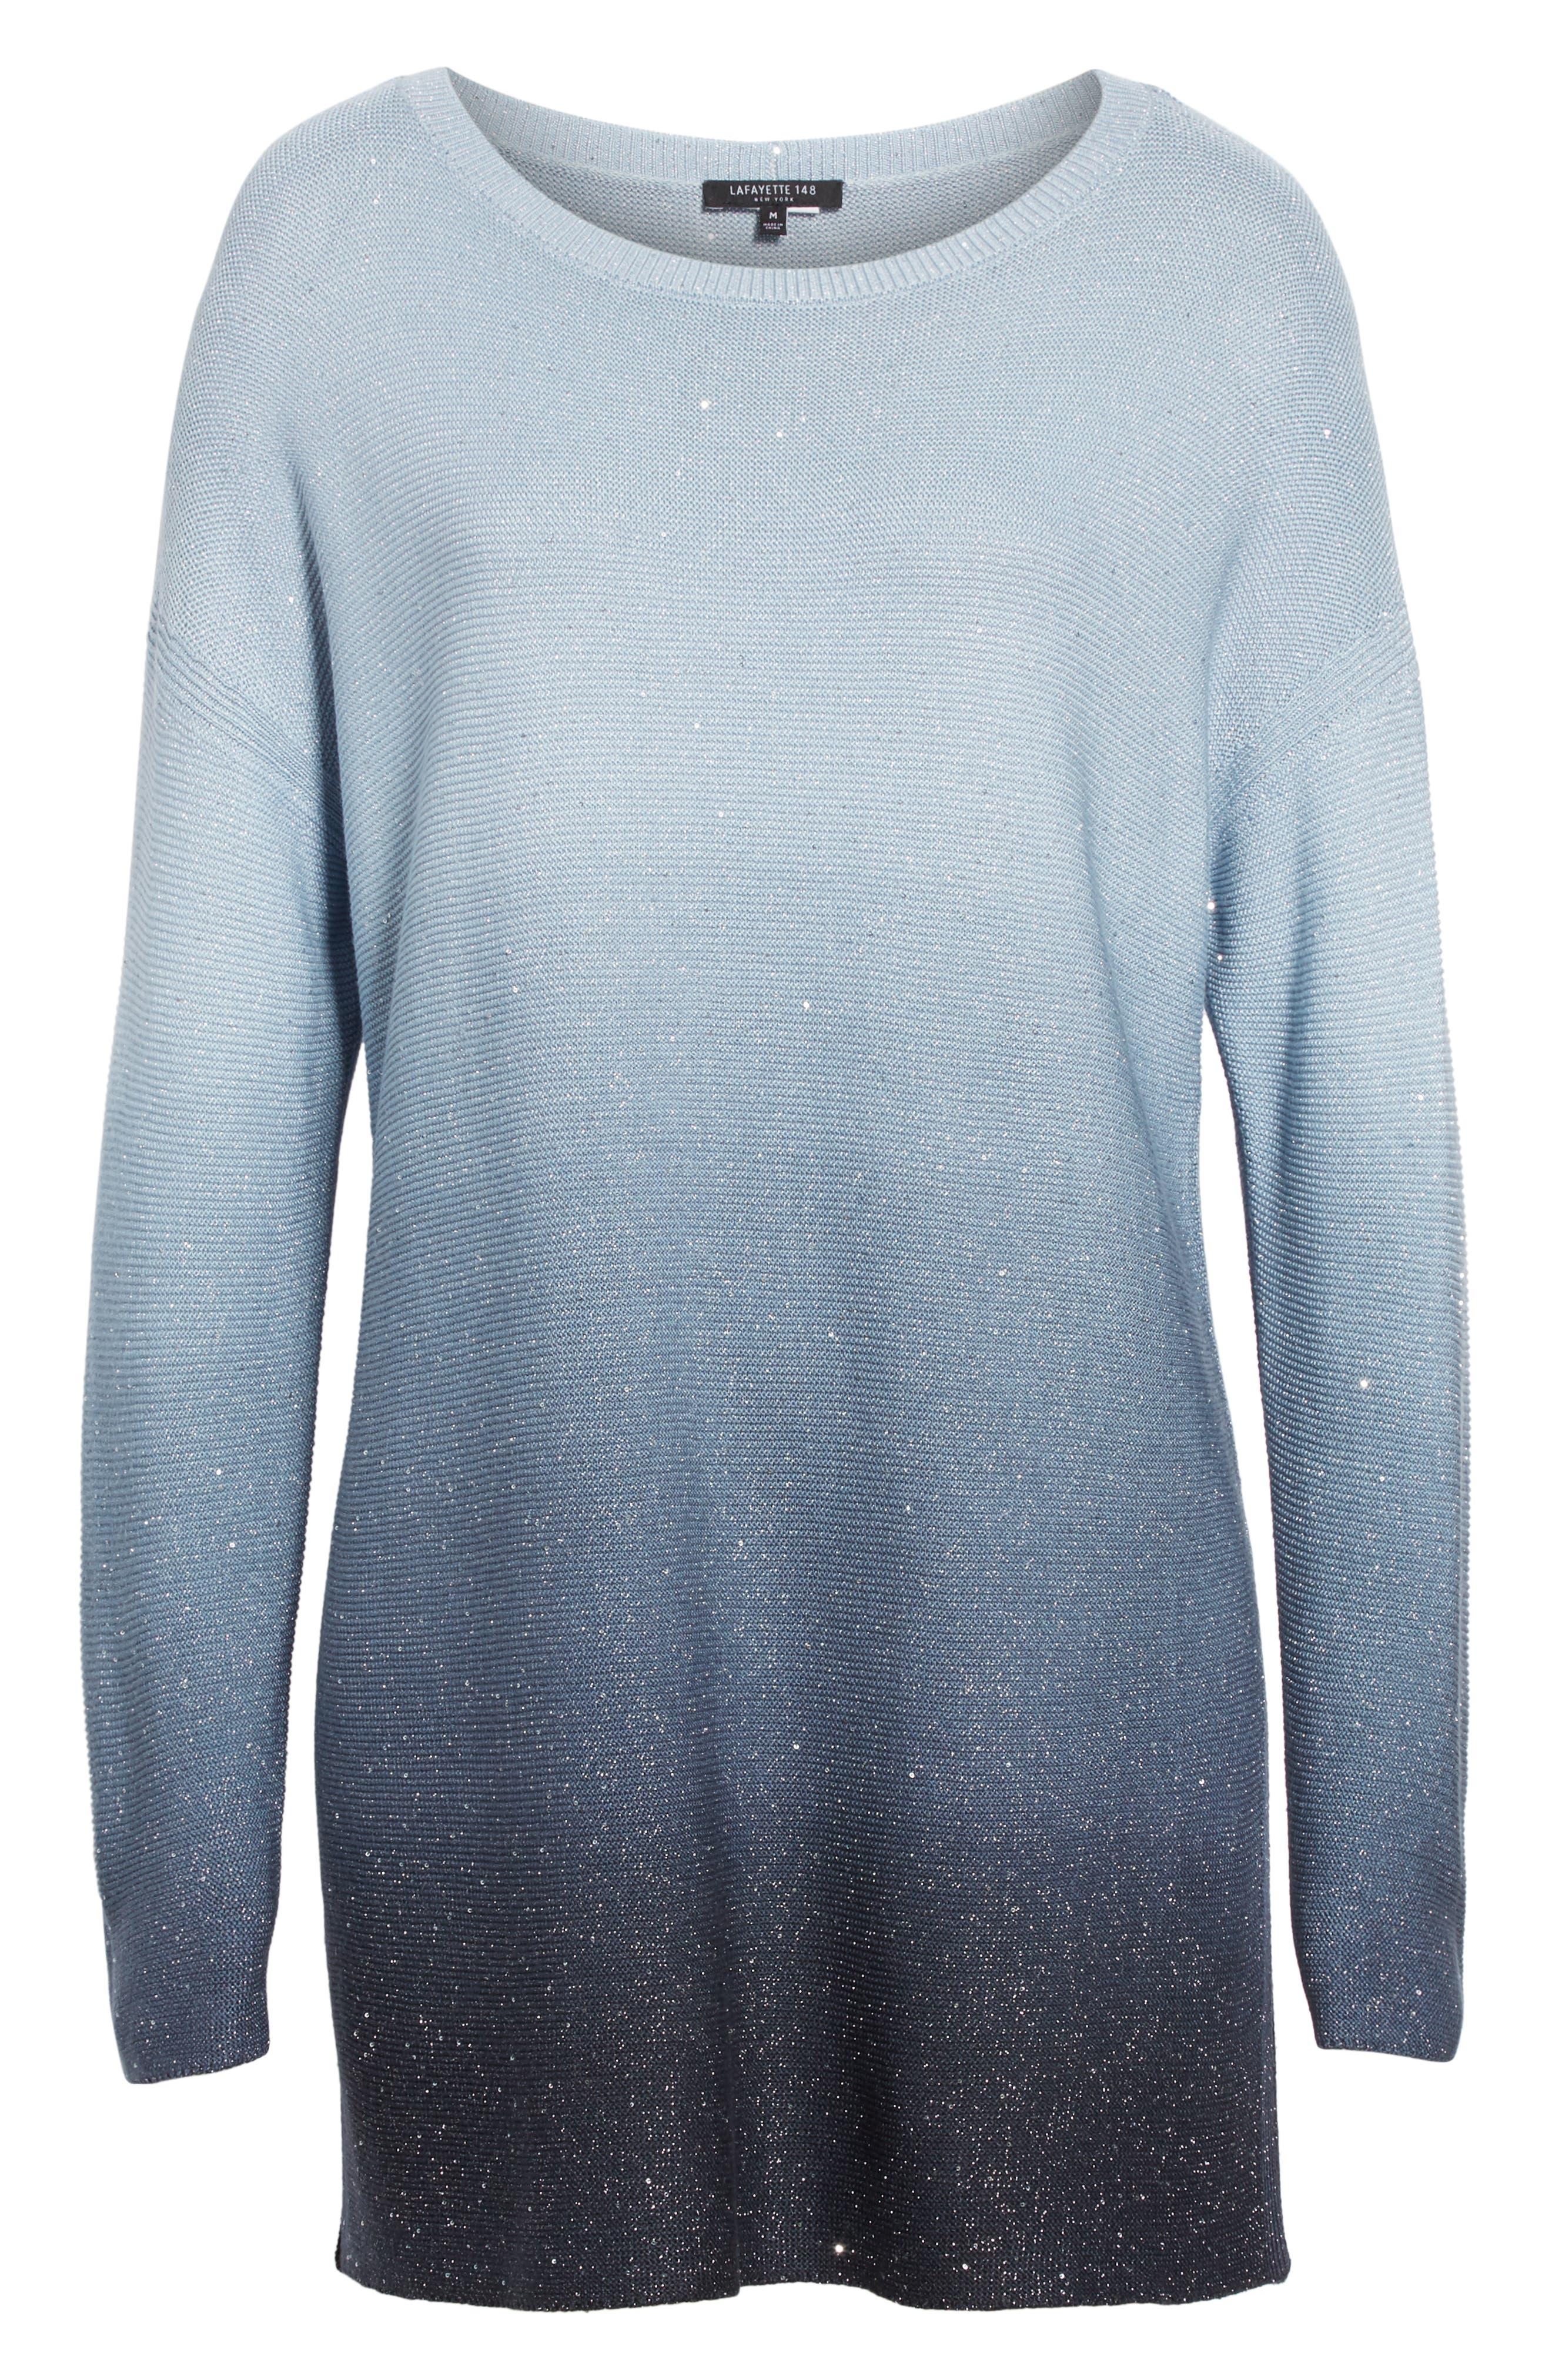 LAFAYETTE 148 NEW YORK, Sequin Ombré Silk Blend Tunic, Alternate thumbnail 6, color, SLATE BLUE MULTI